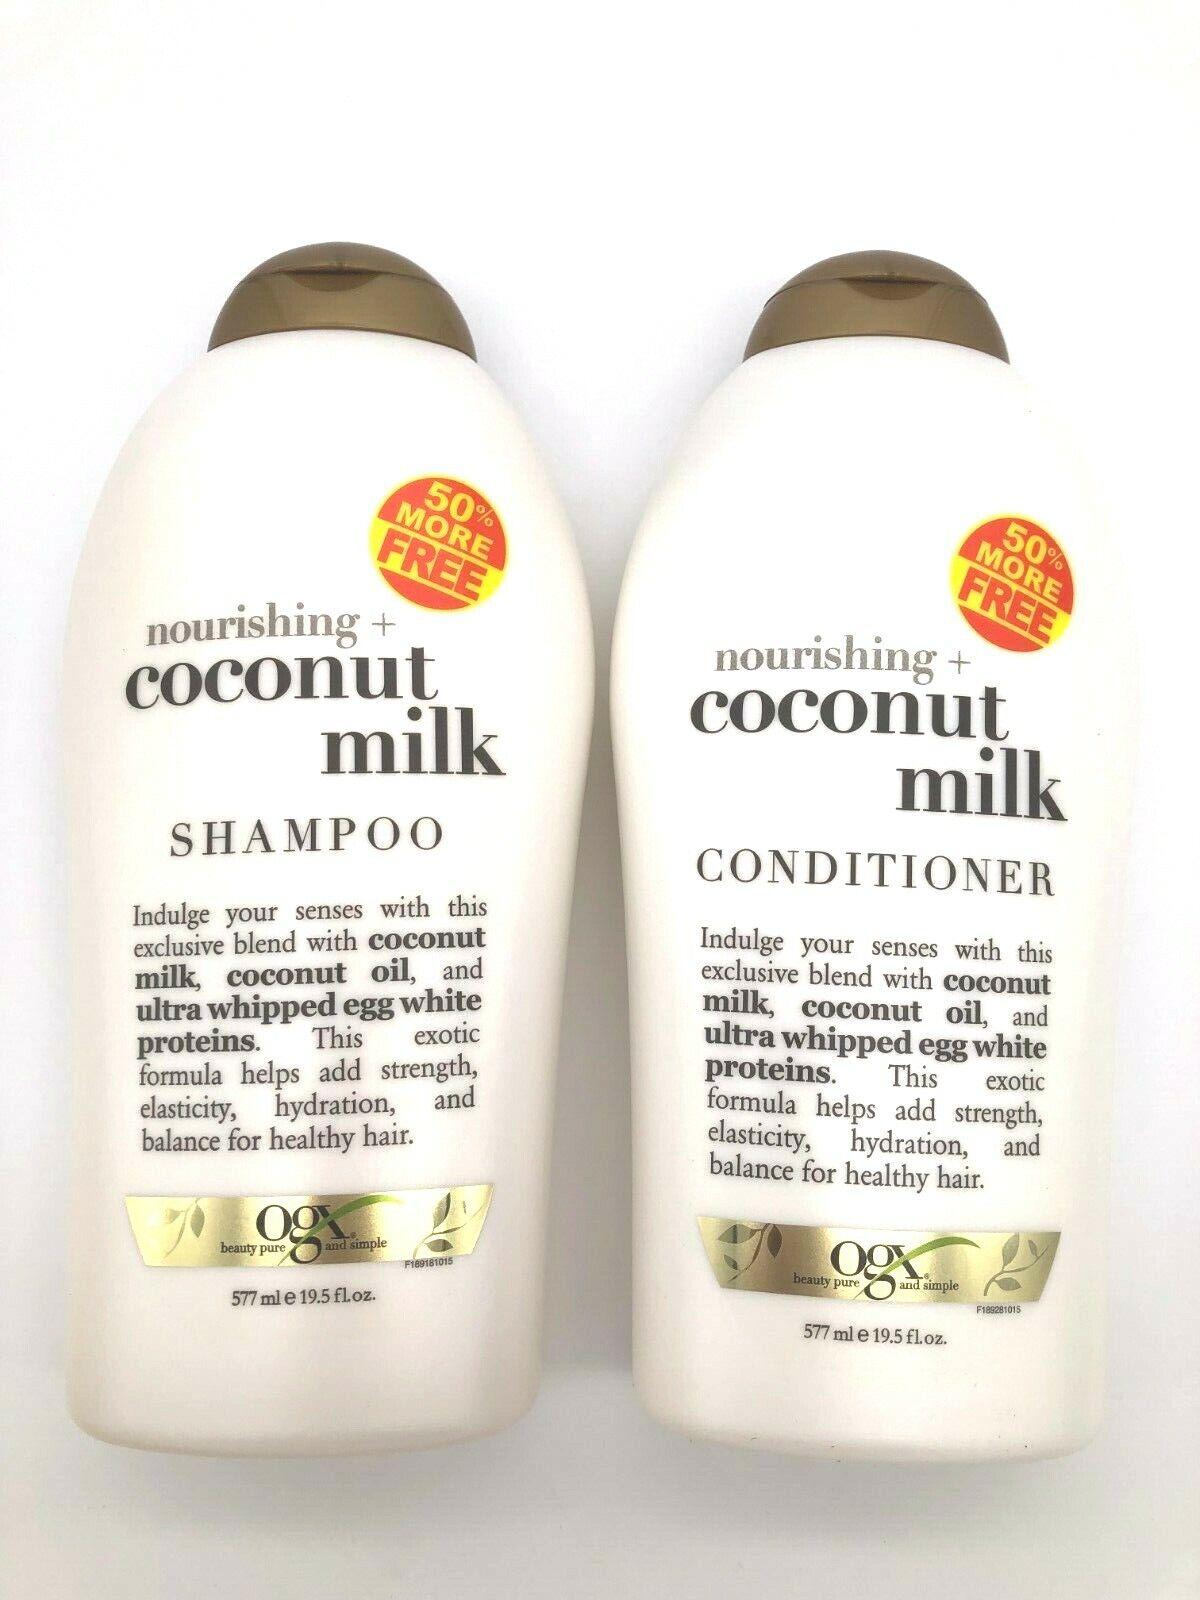 OGX Nourishing Coconut Milk Shampoo + Conditioner 19.5 oz Ea